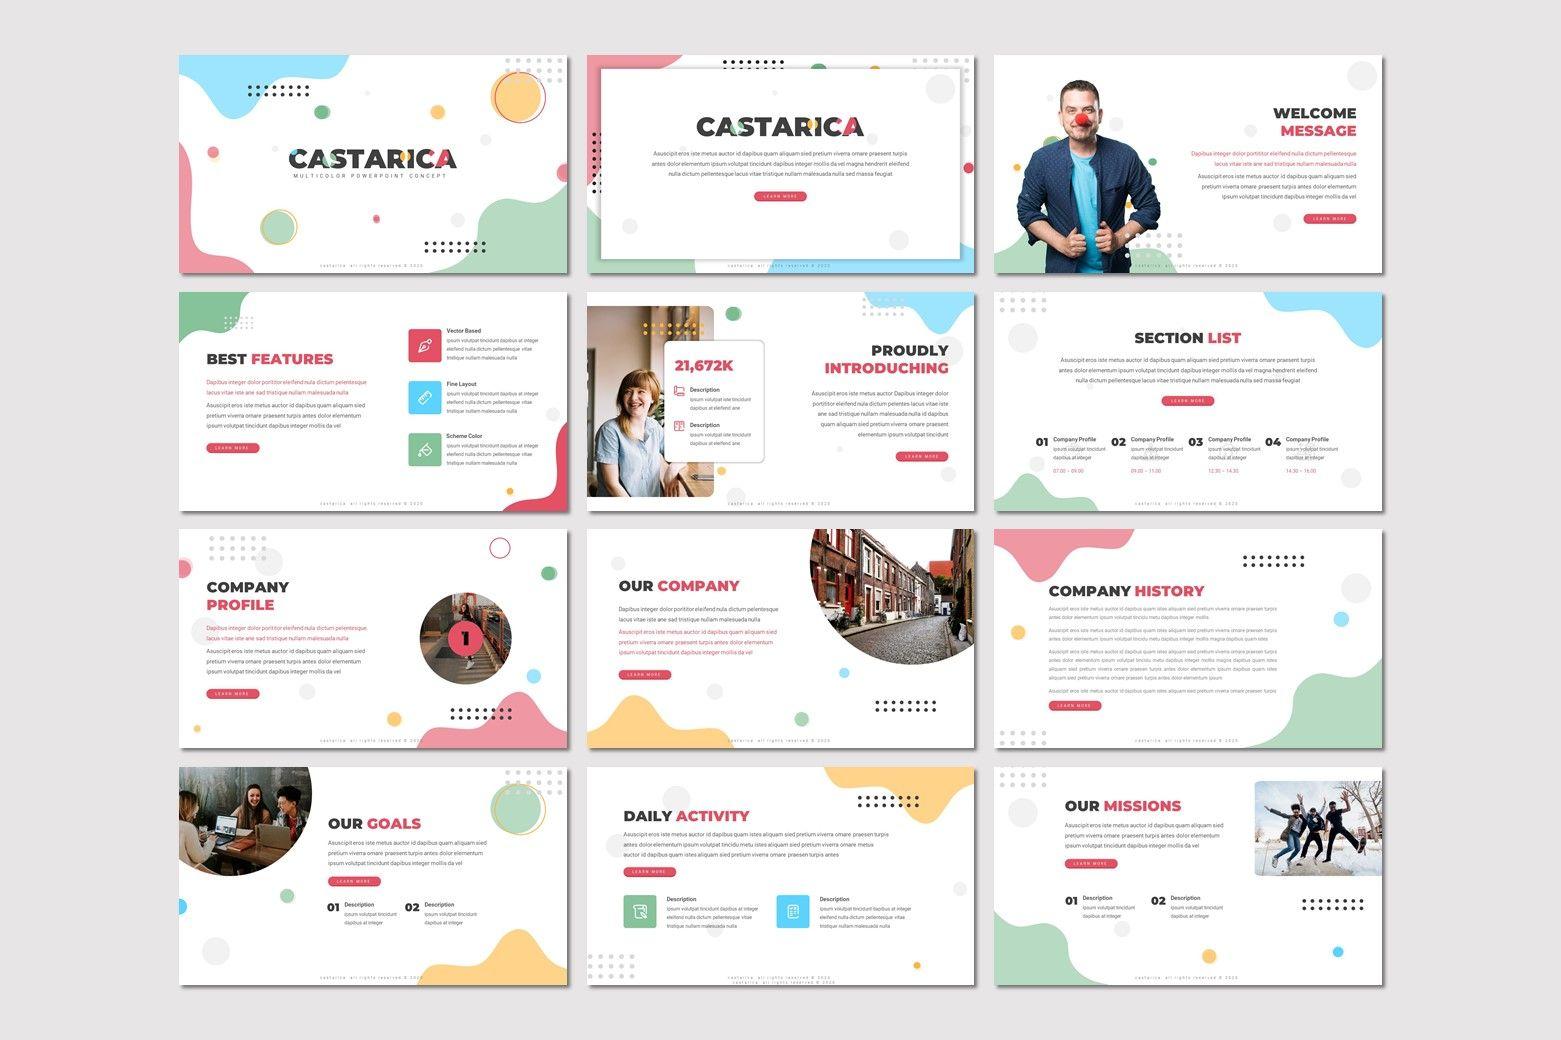 Castarica - Powerpoint Template, Slide 2, 07760, Presentation Templates — PoweredTemplate.com